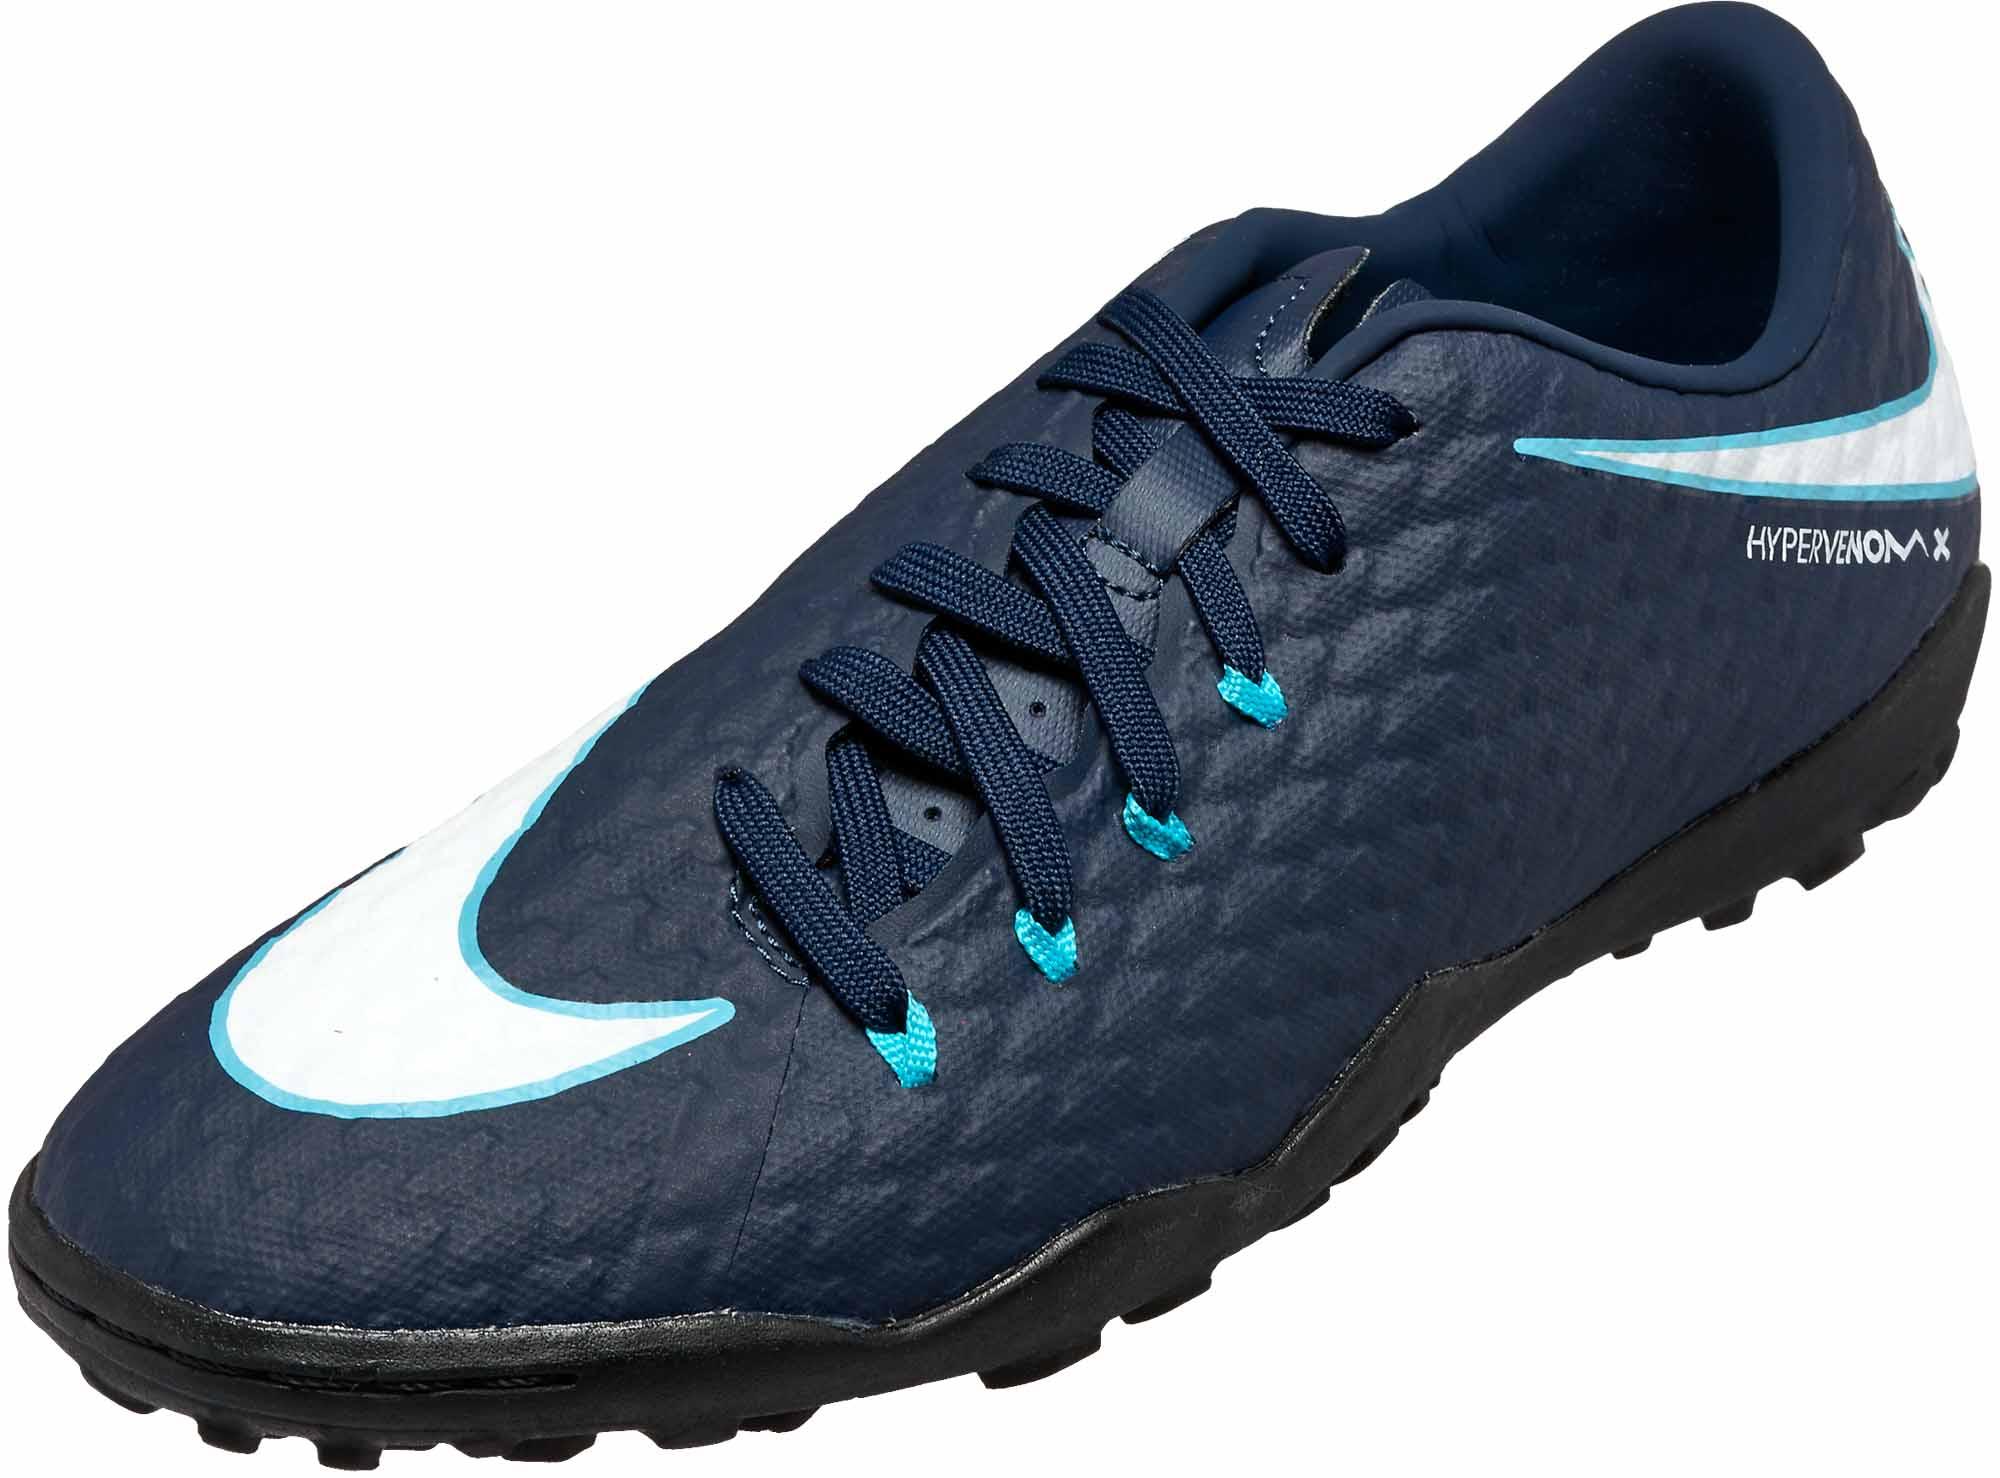 newest e3653 936da Nike Hypervenom Phelon III TF – Obsidian/White